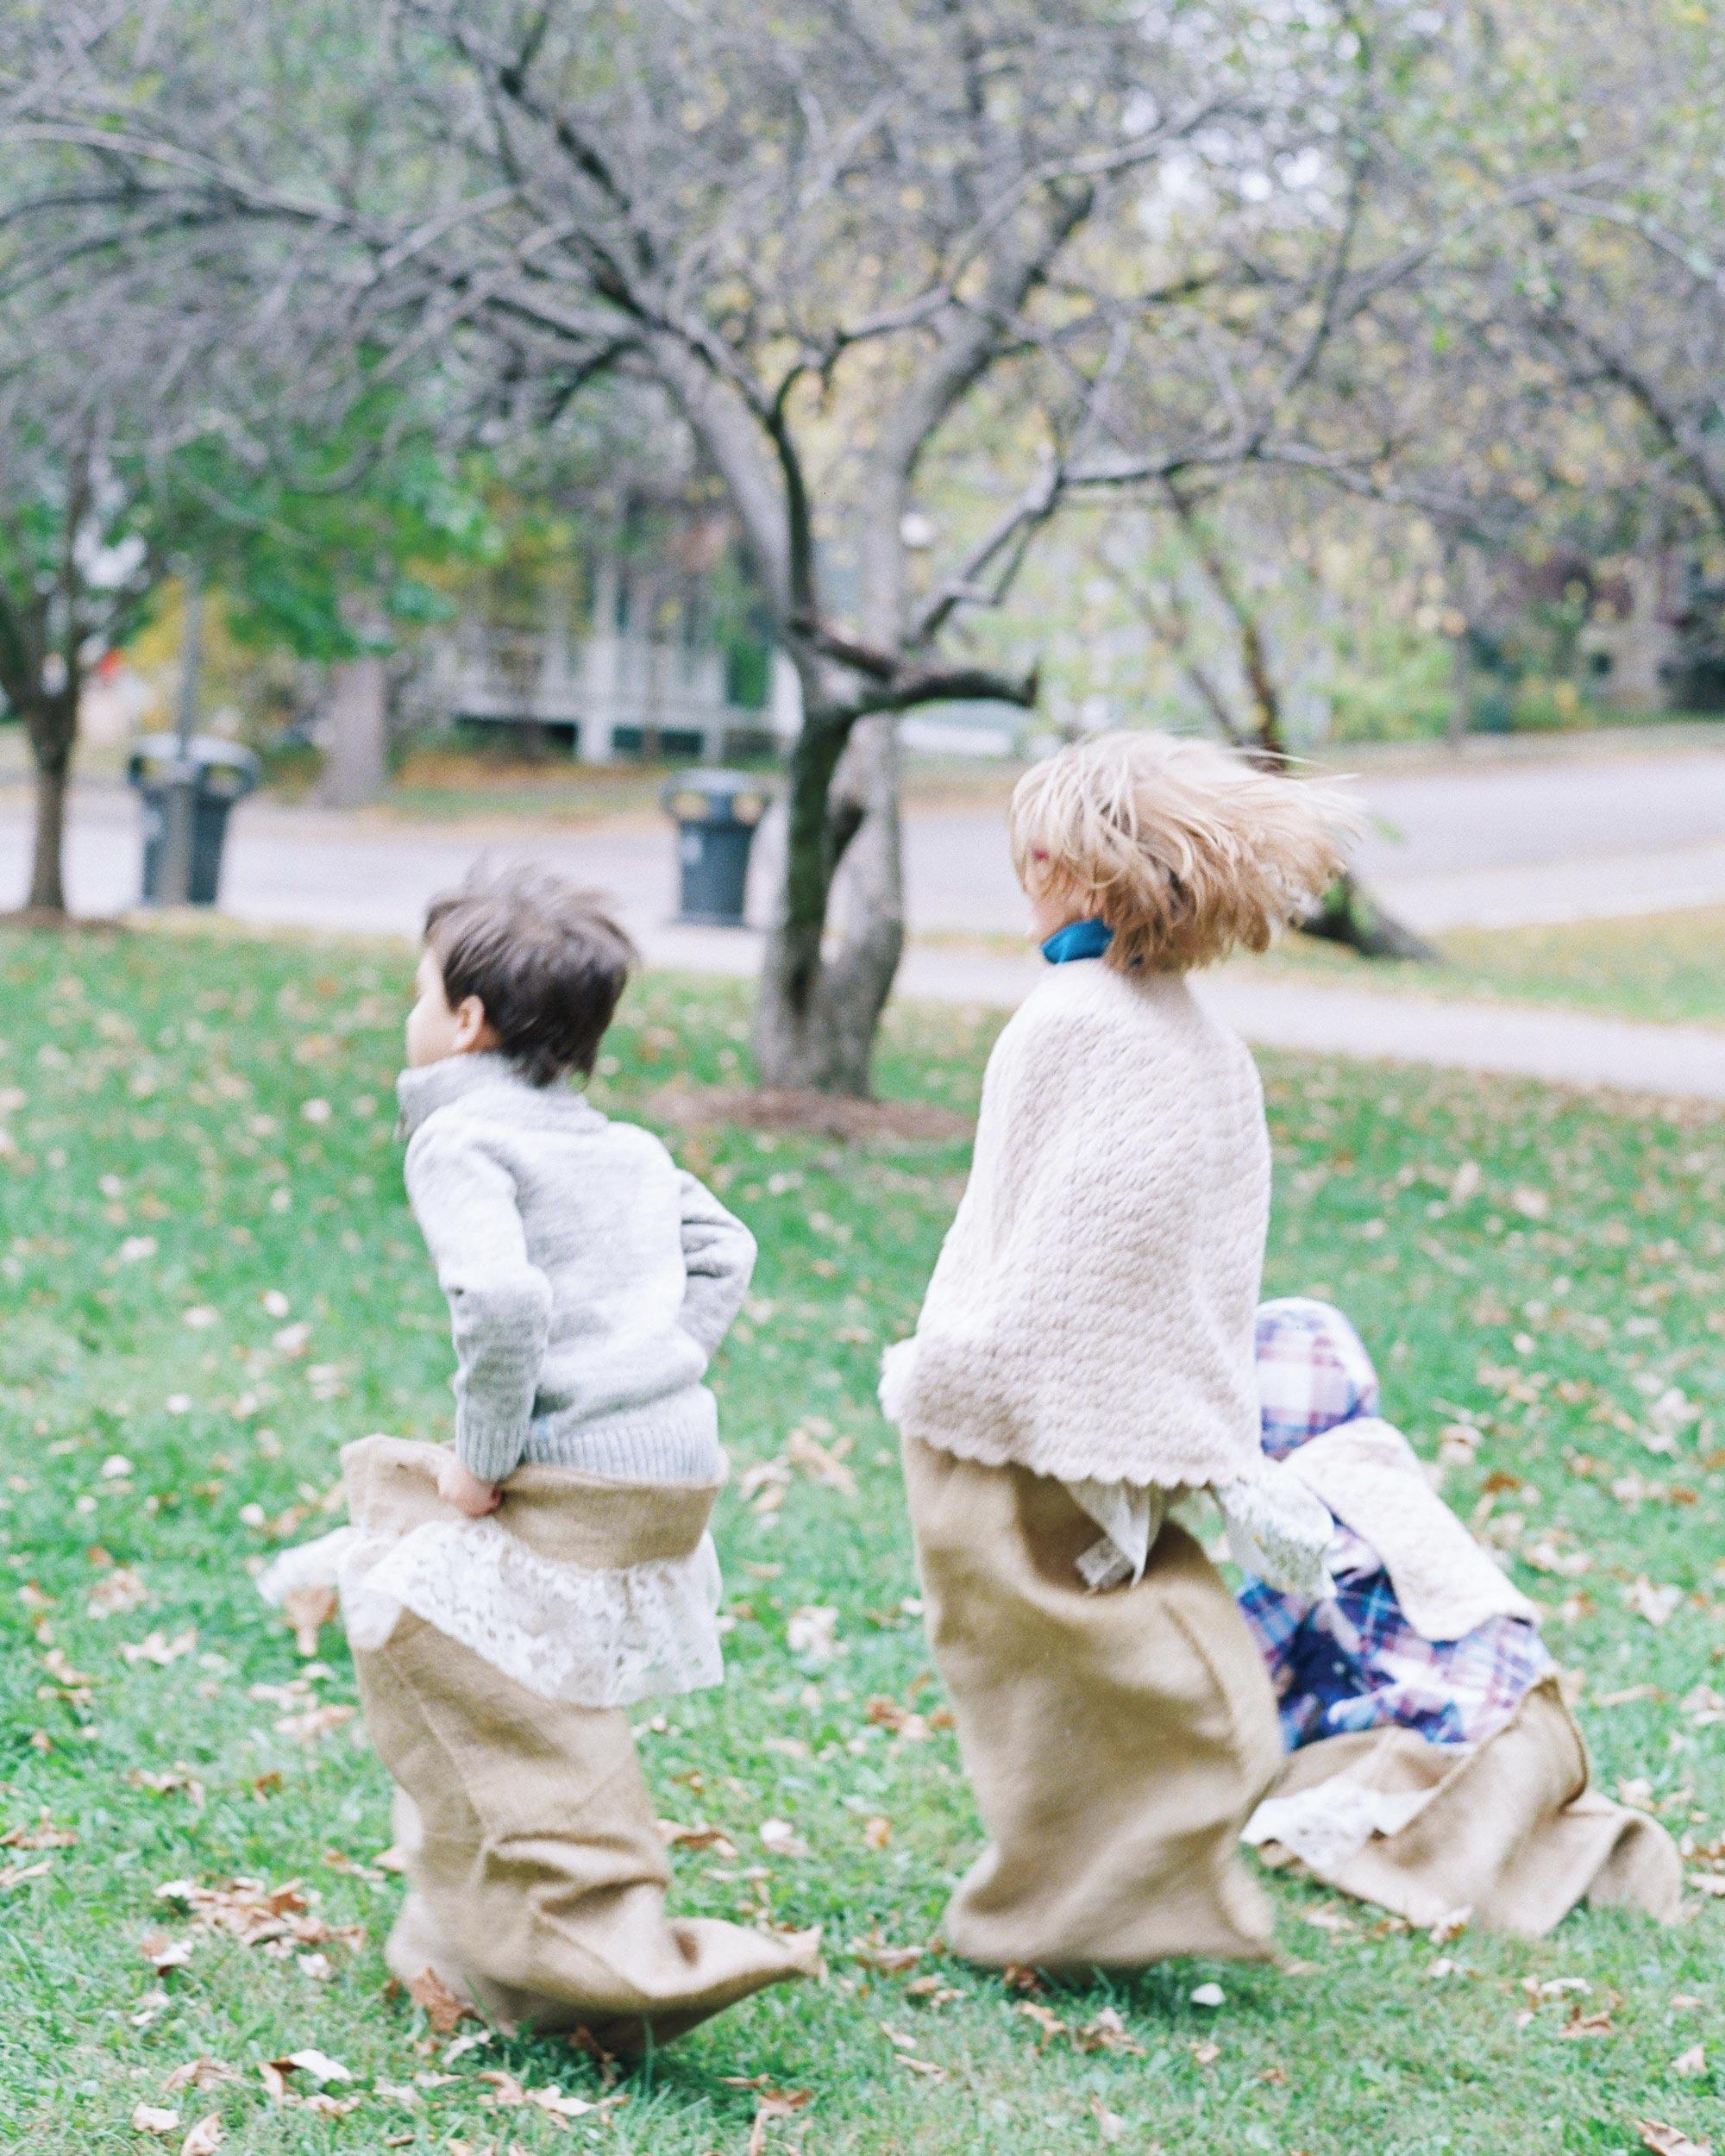 adrienne-jason-real-wedding-kids-bean-bag-racing.jpg